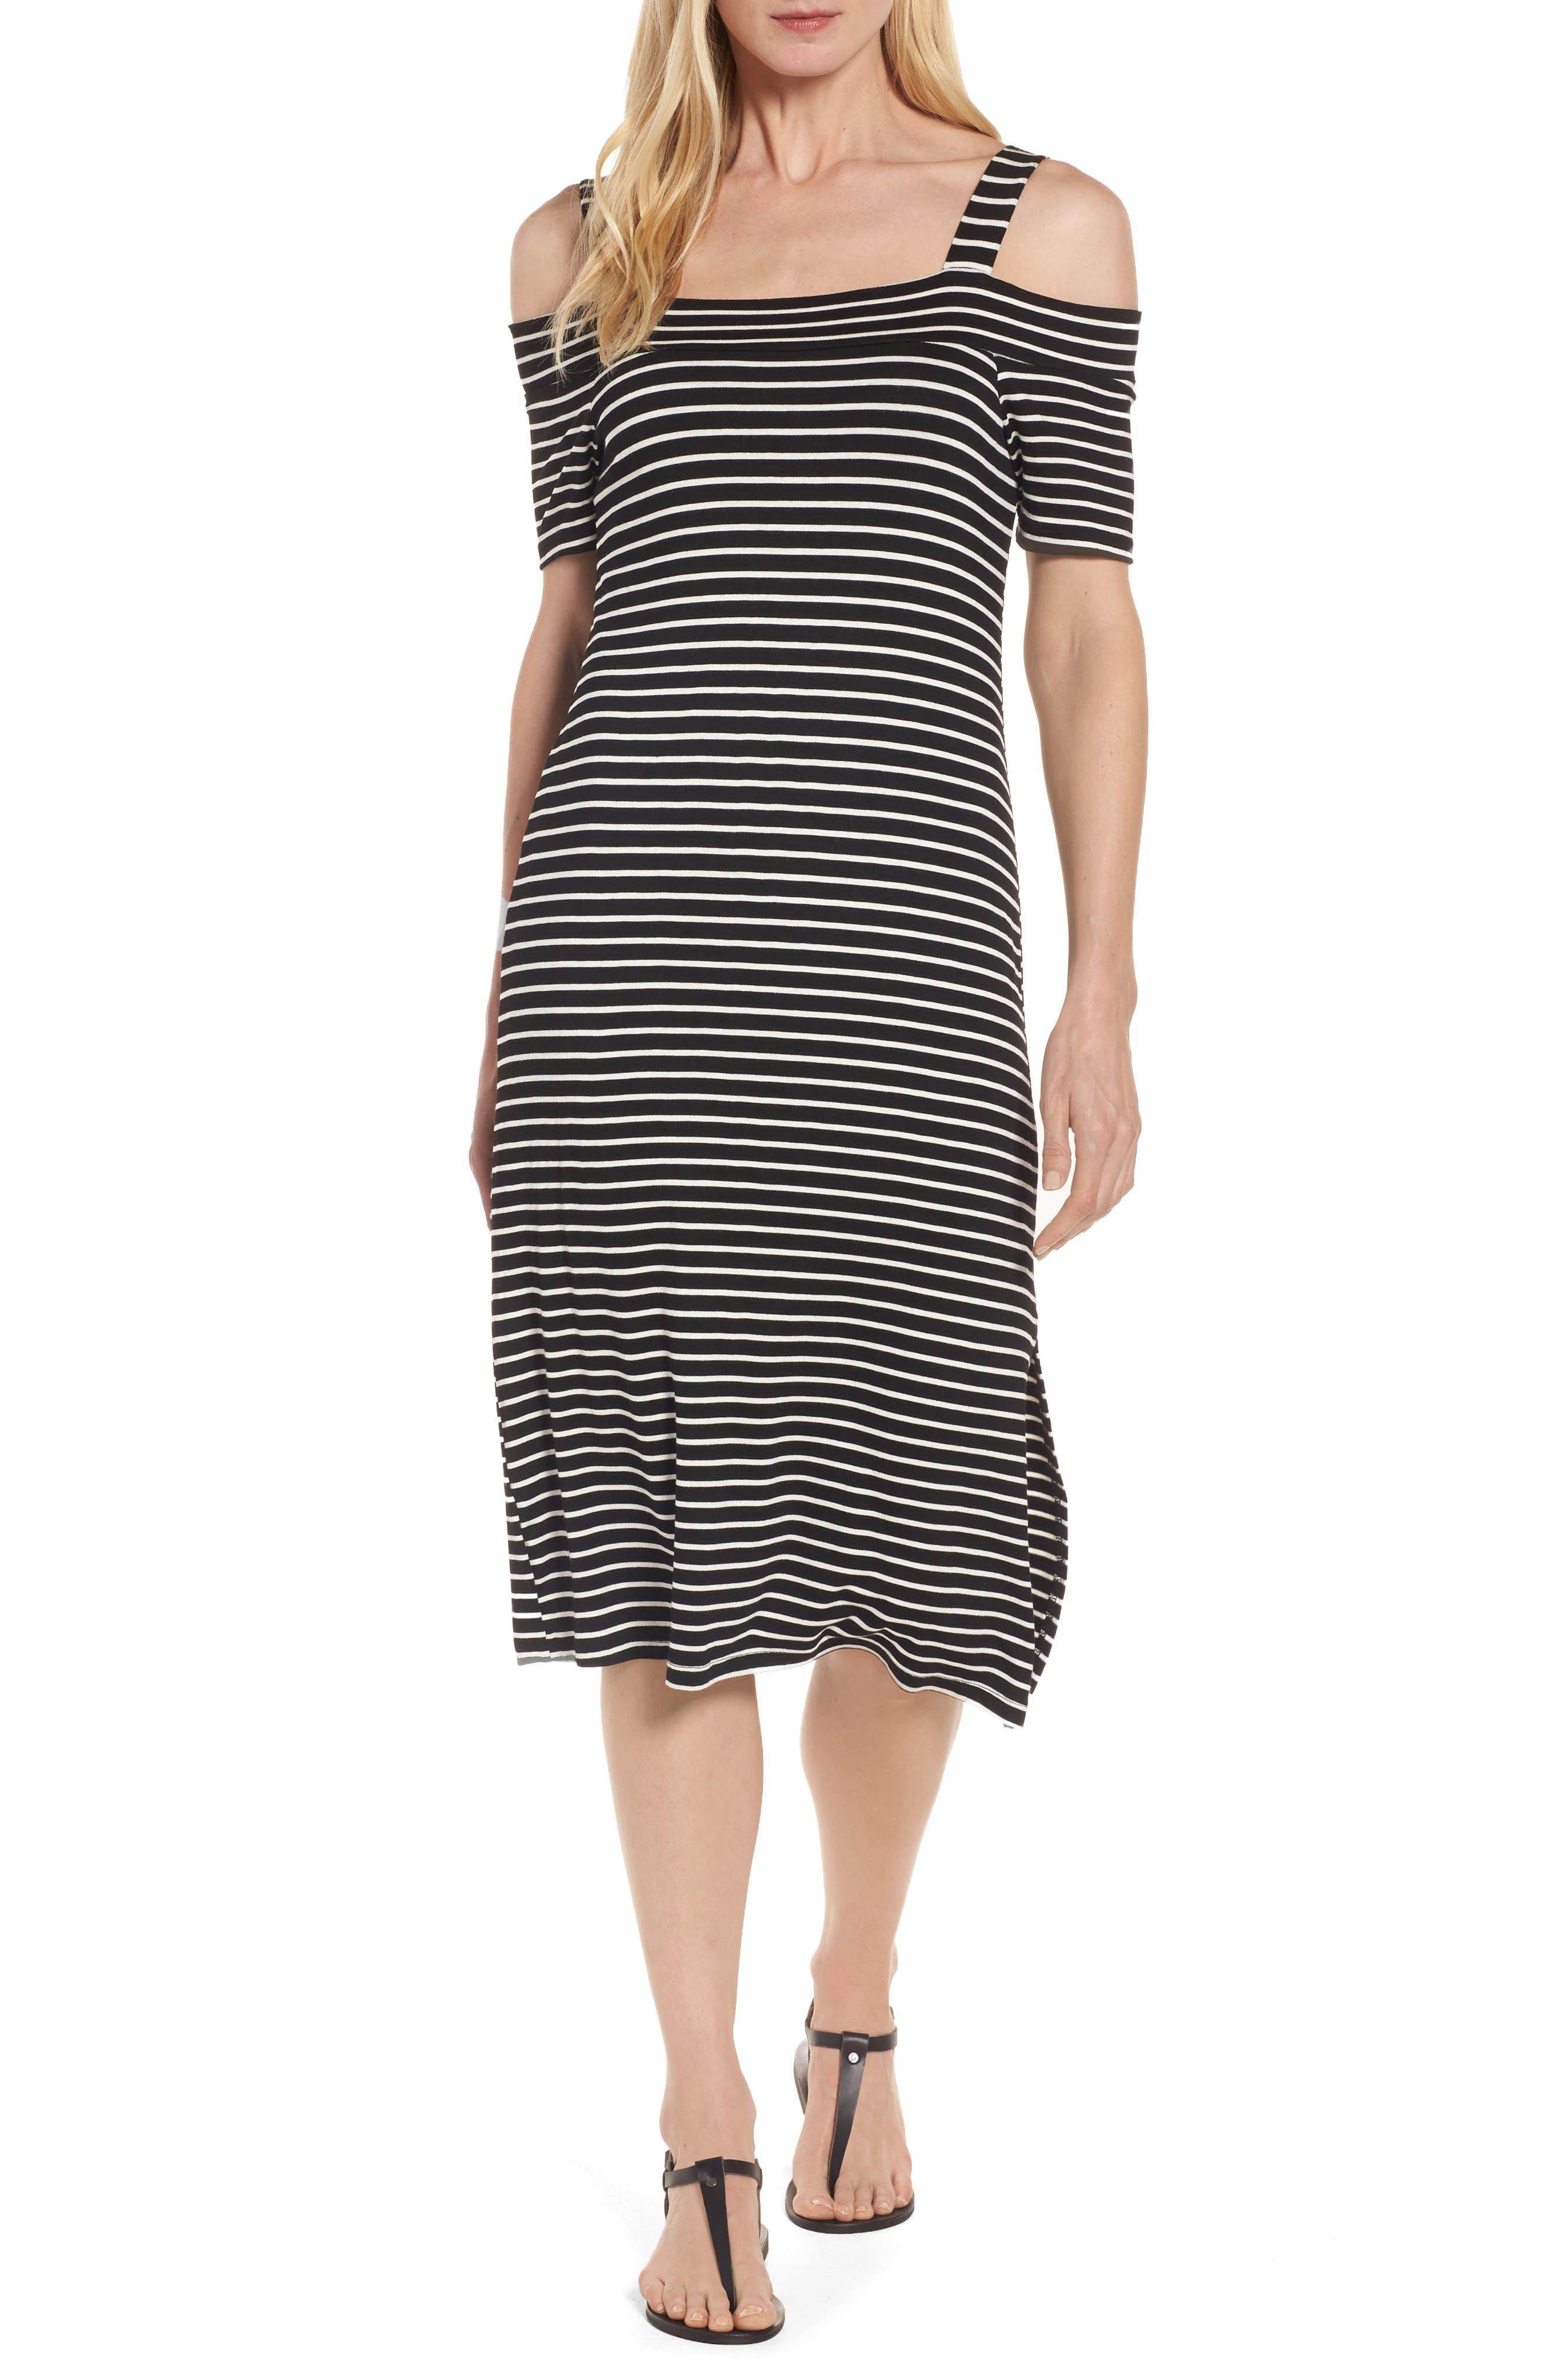 Bobeau Off the Shoulder Stripe A-Line Dress